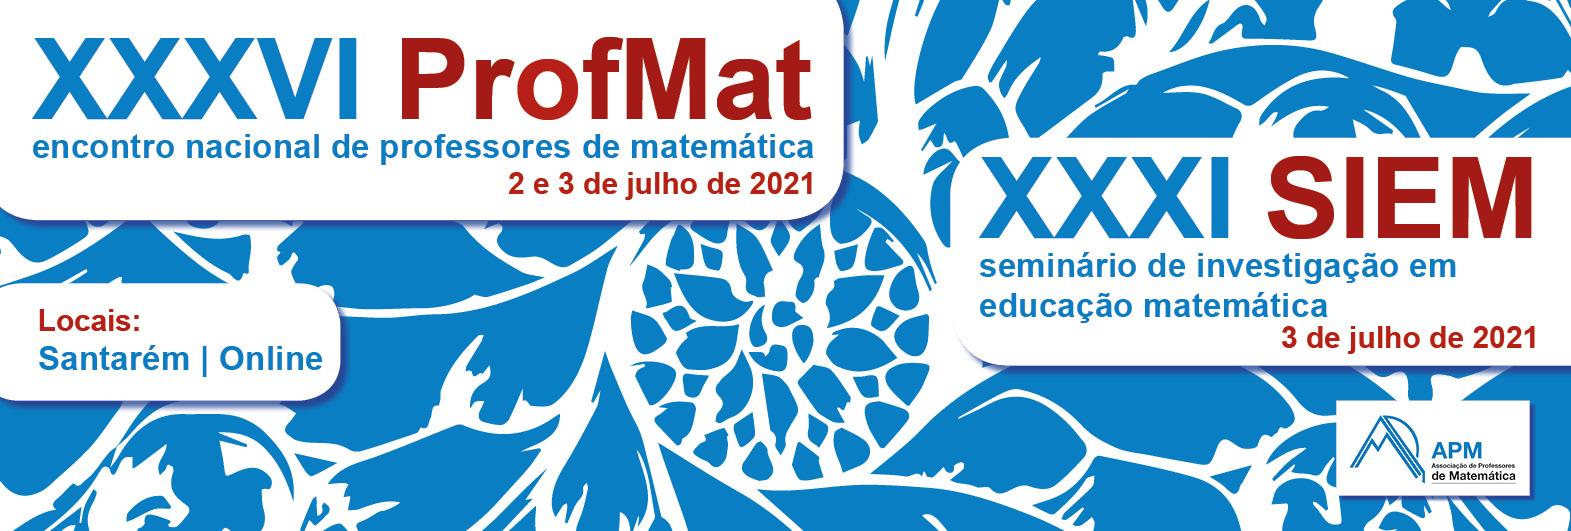 Banner ProfMat 2021 - Santarém